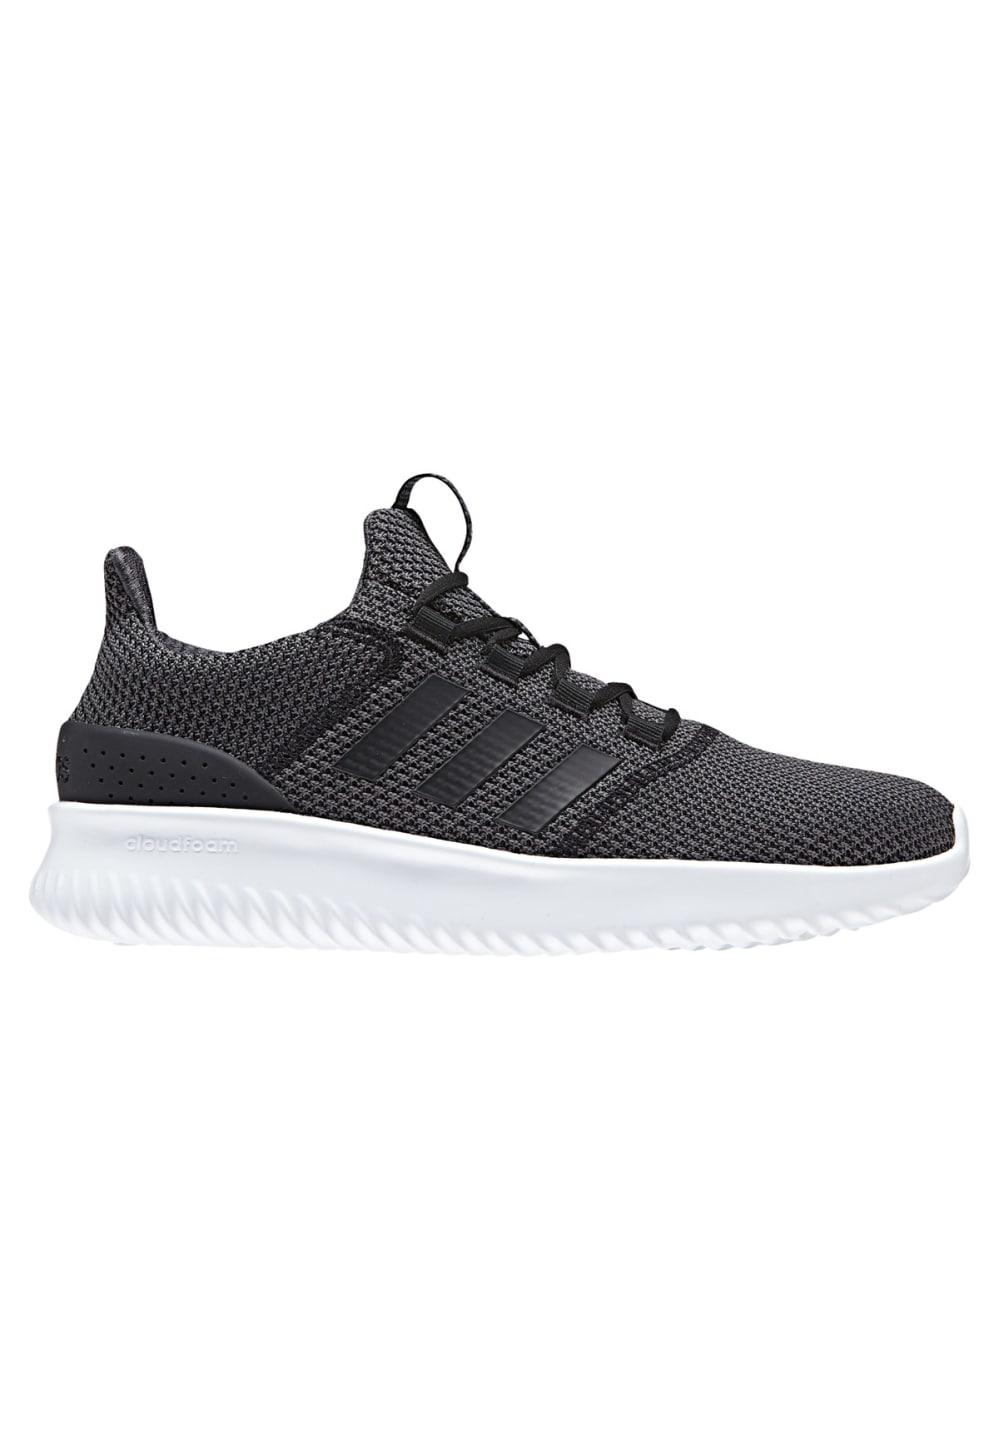 adidas neo Cloudfoam Ultimate - Sneaker für Herren - Schwarz